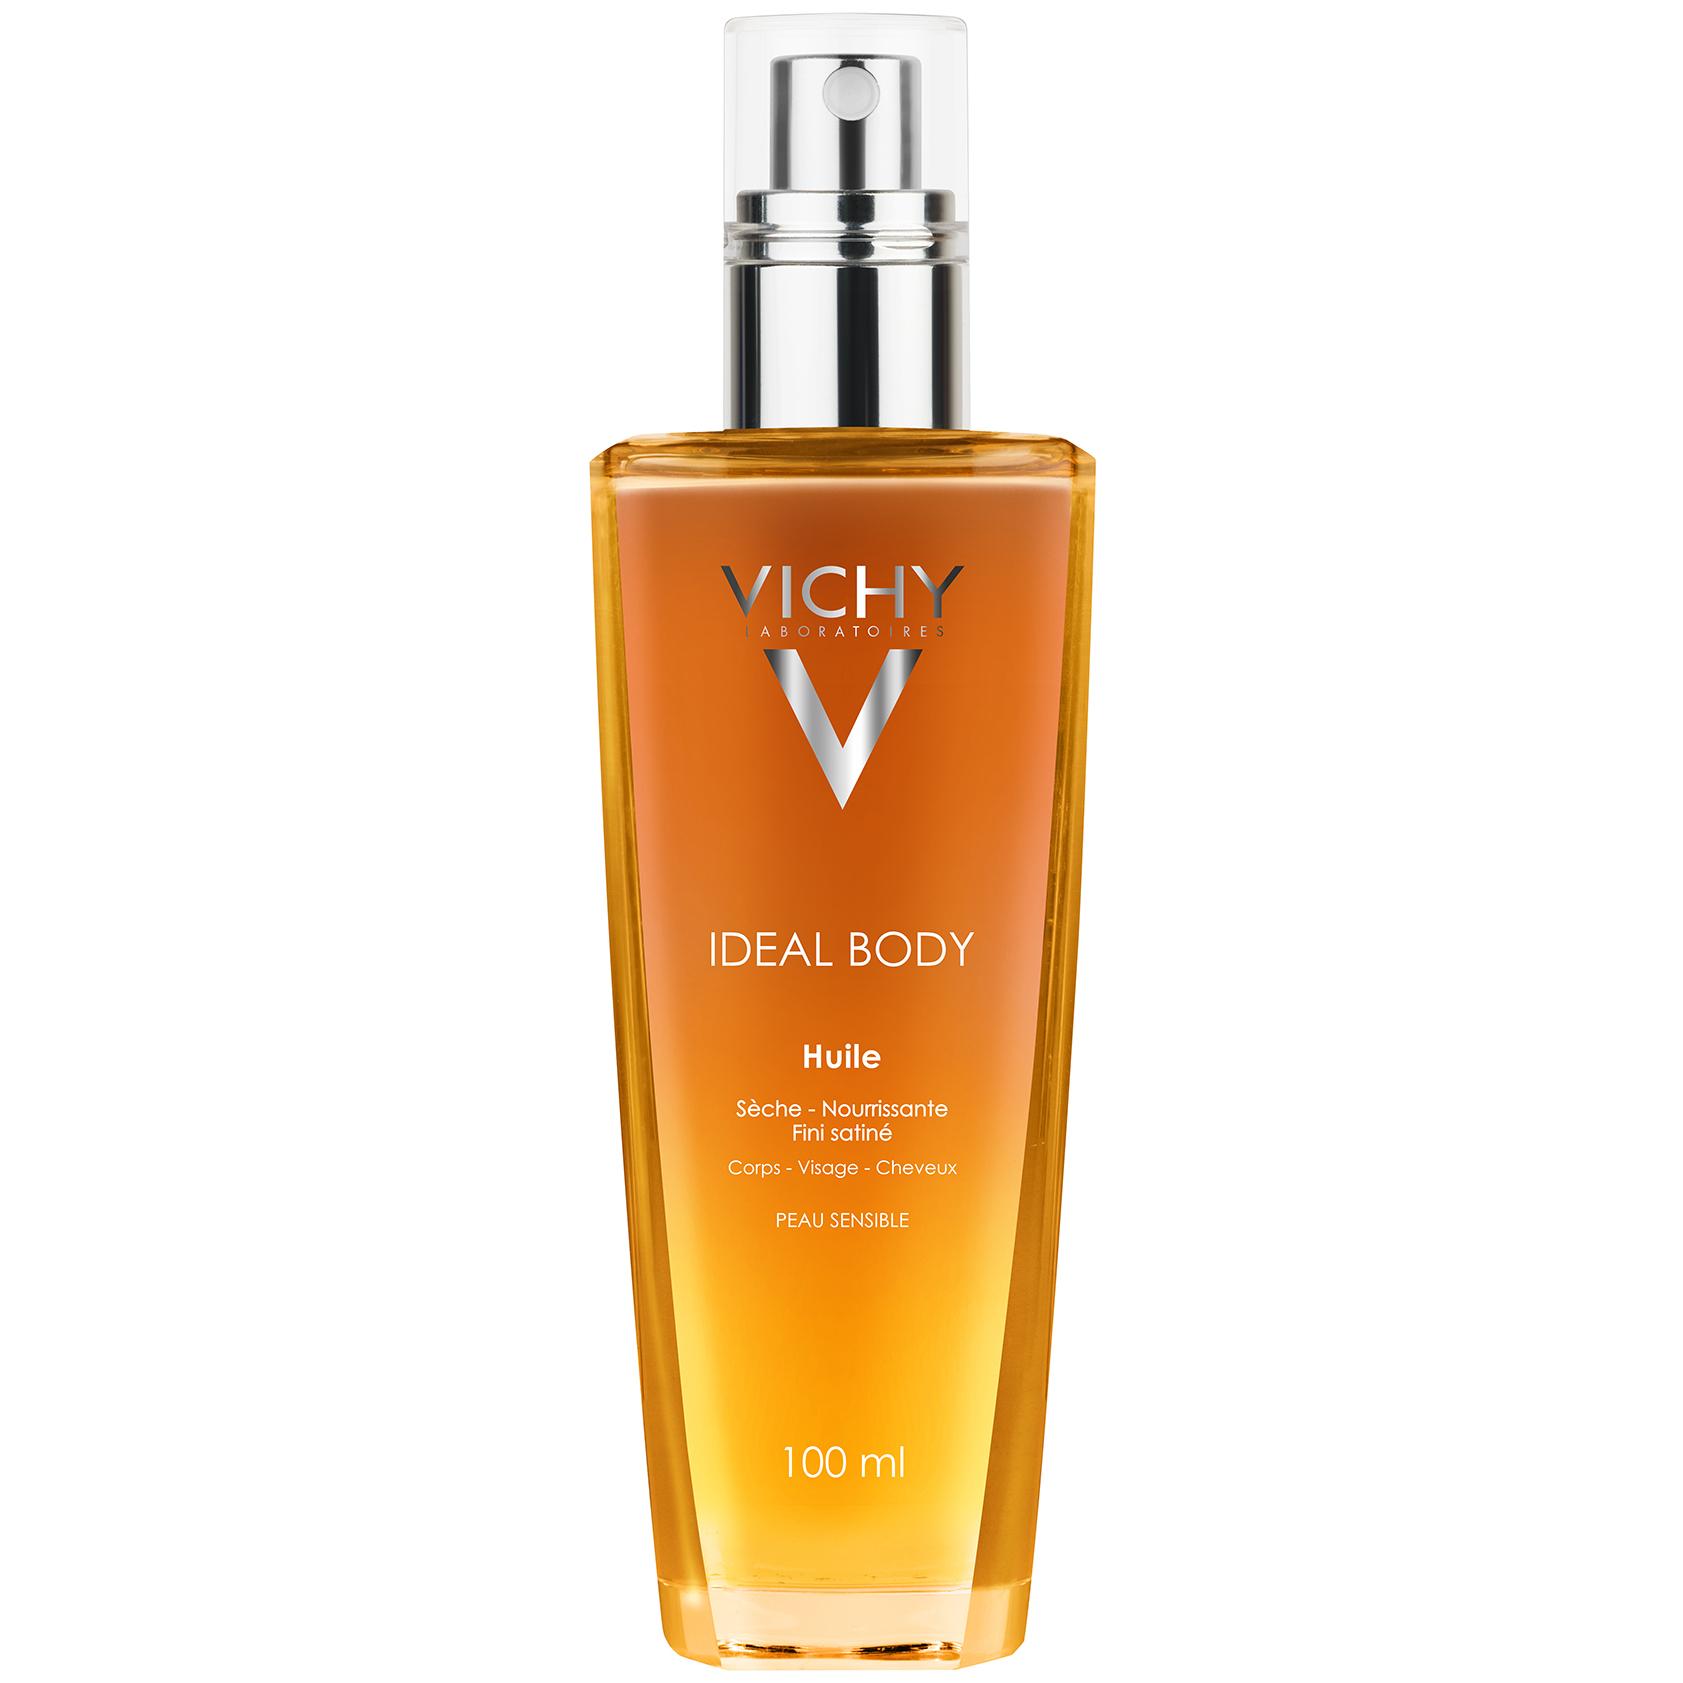 Vichy Ideal Body Ξηρό Λάδι Φροντίδας για Μαλλιά, Πρόσωπο &Σώμα 100ml υγιεινή   μαλλιά   μαλακτικά μάσκες ελιξίρια μαλλιών